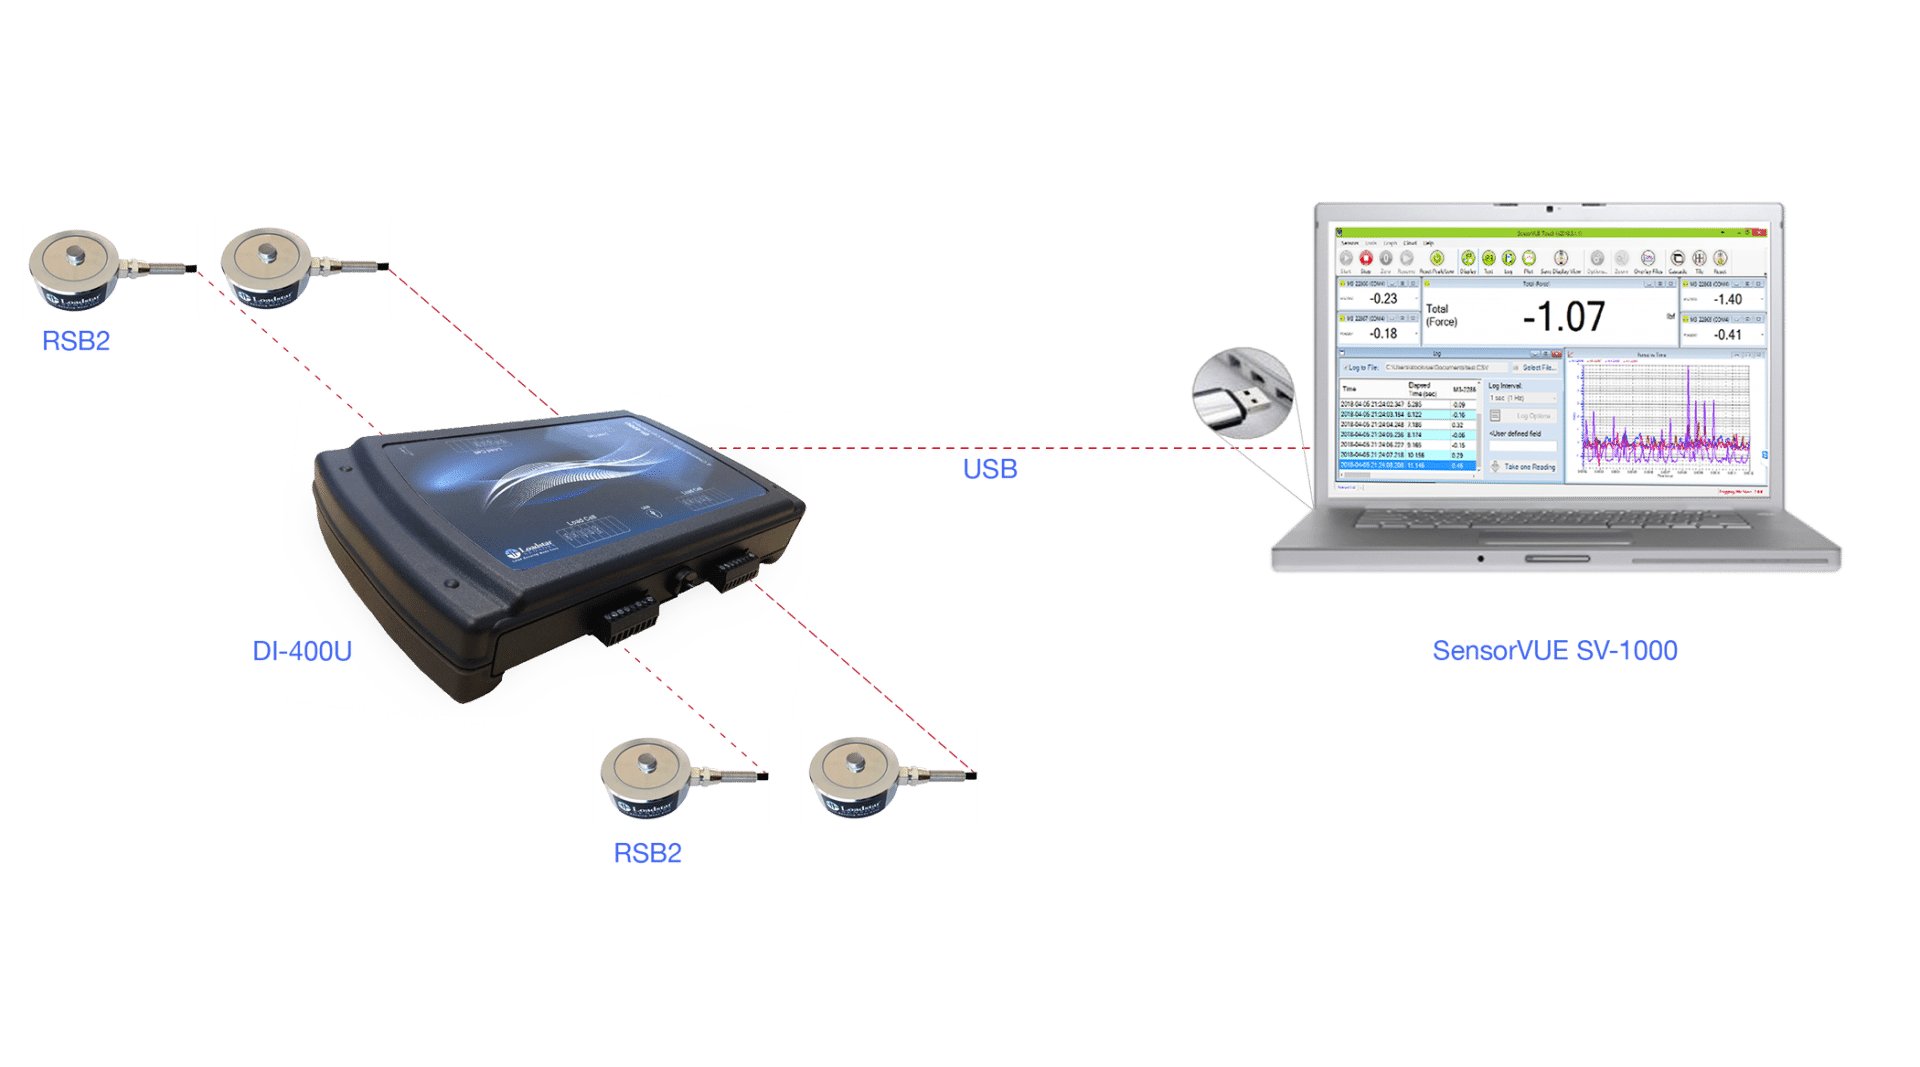 Kraftmesssystem Kraftmessdose RSB2 mit 4-Kanal USB Interface und Software LoadVUE Pro